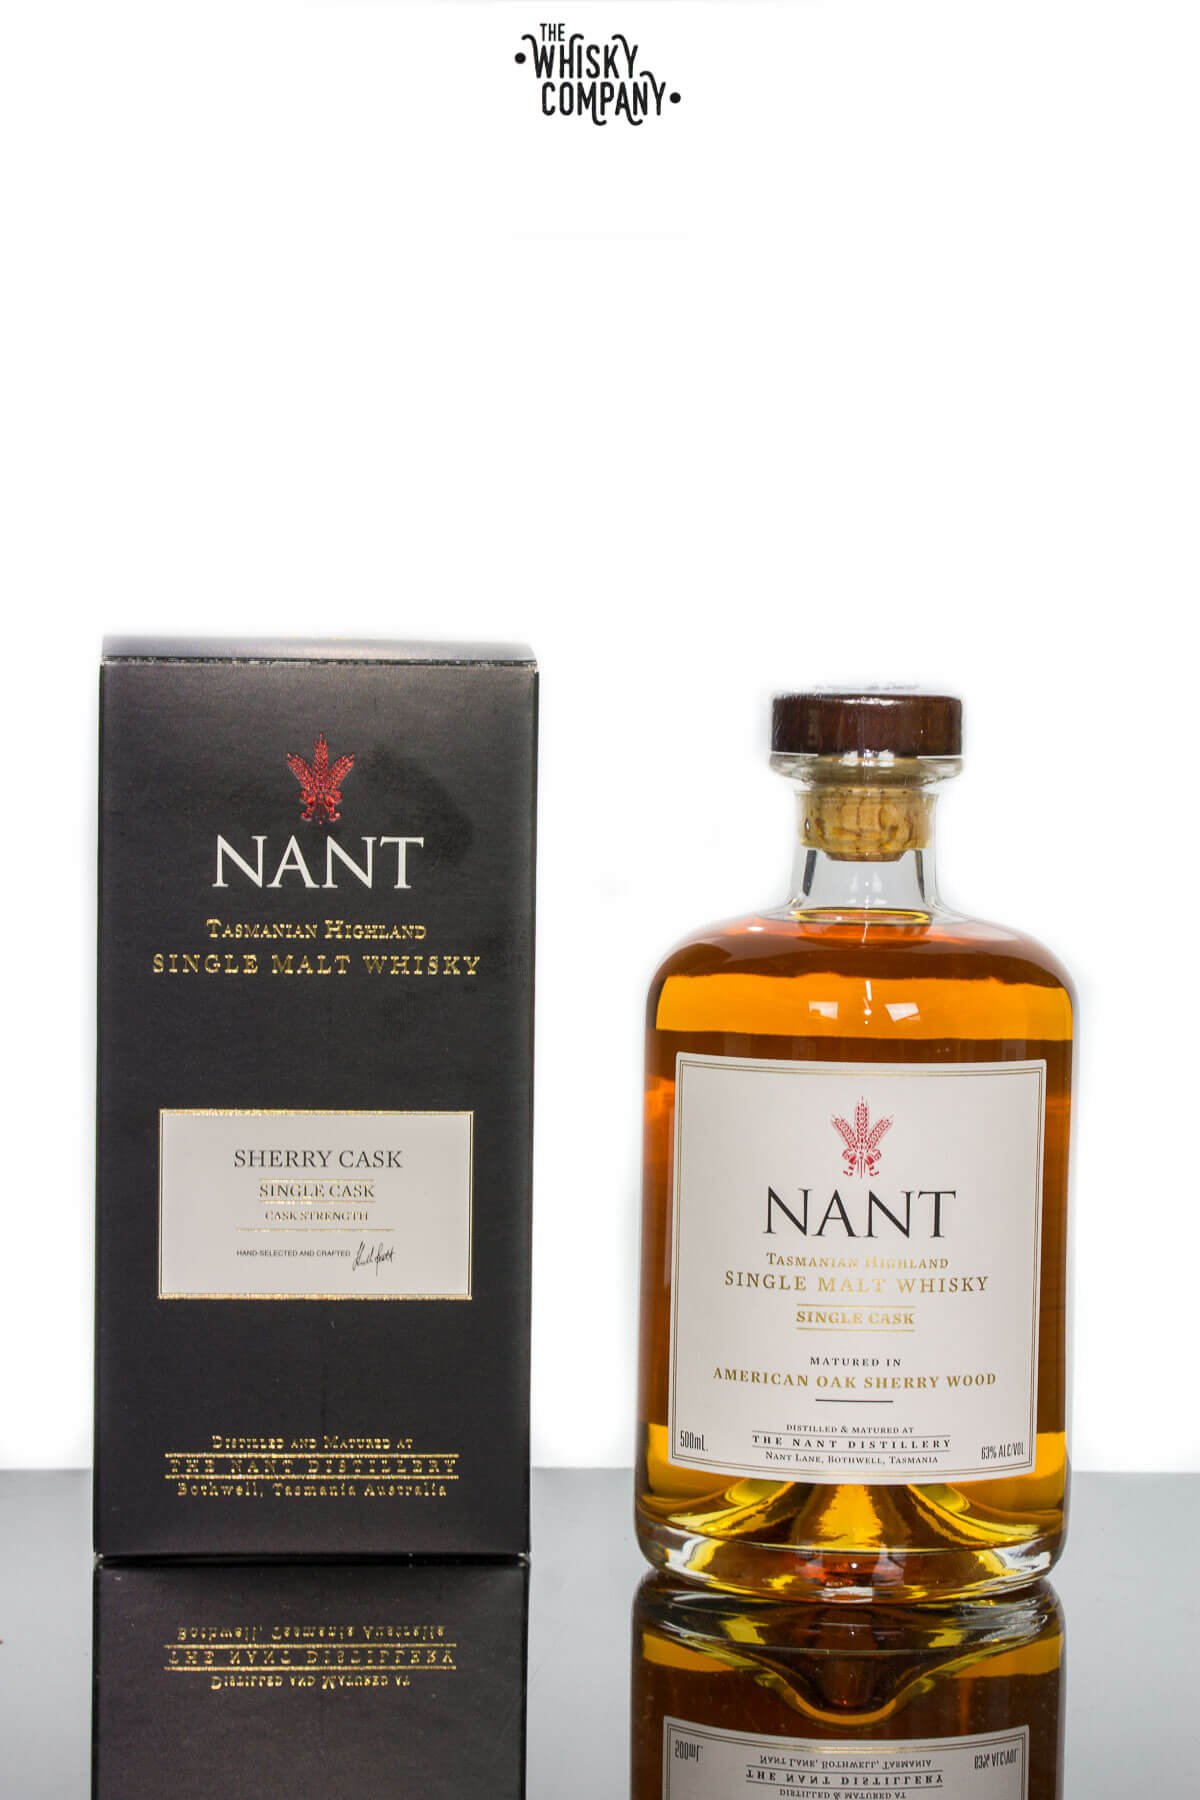 Nant Sherry Wood Cask Strength Tasmanian Highland Single Malt Whisky (500ml)